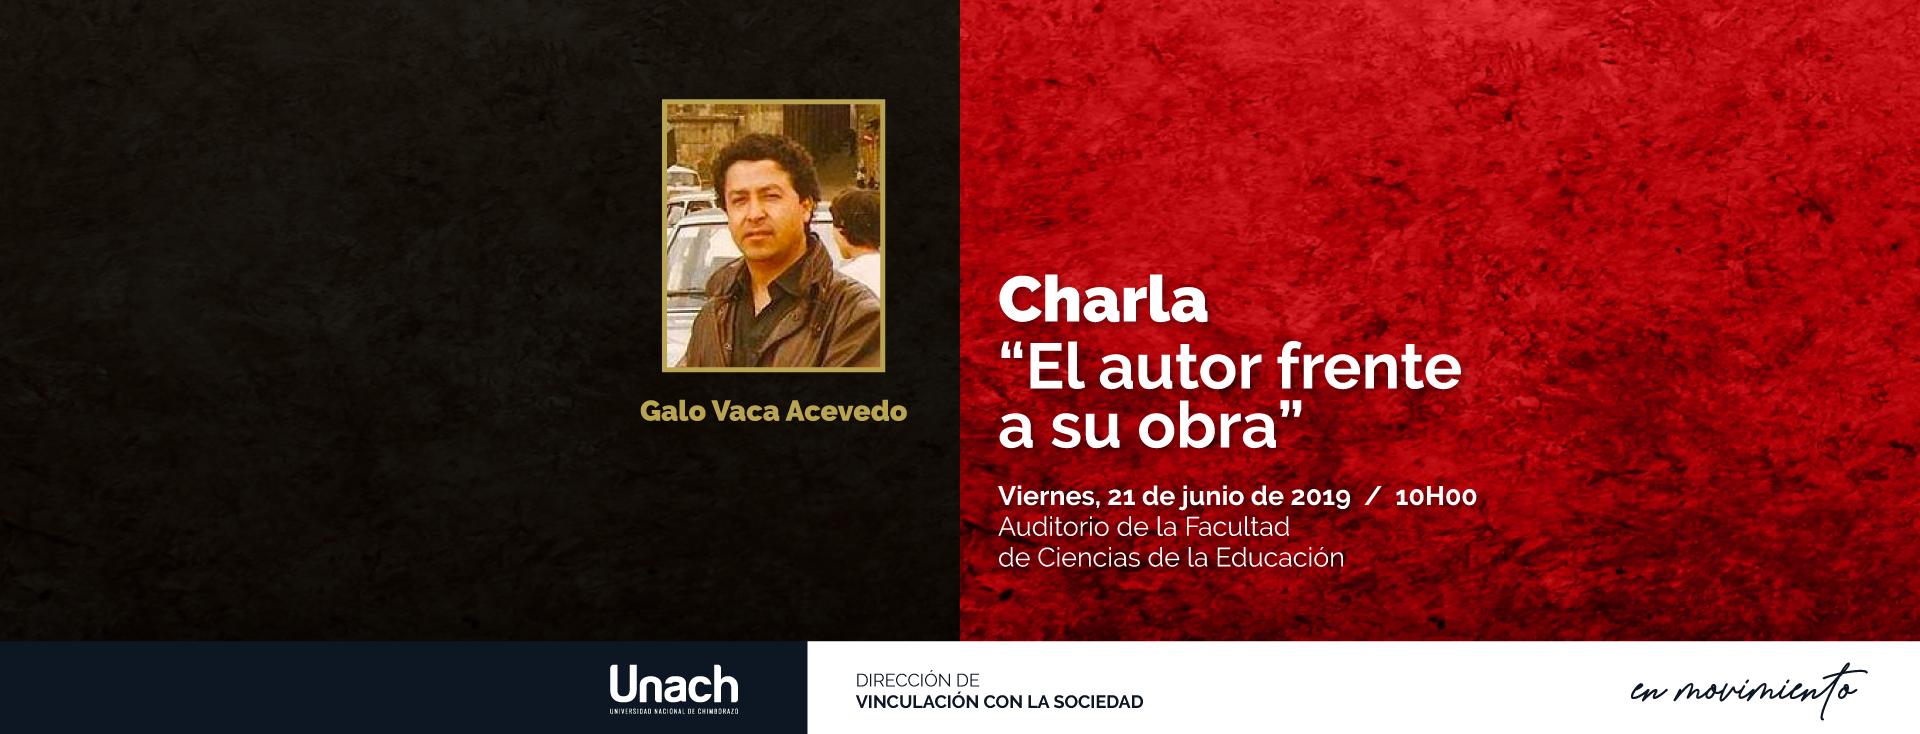 CHARLA :  EL AUTOR FRENTE A SU OBRA